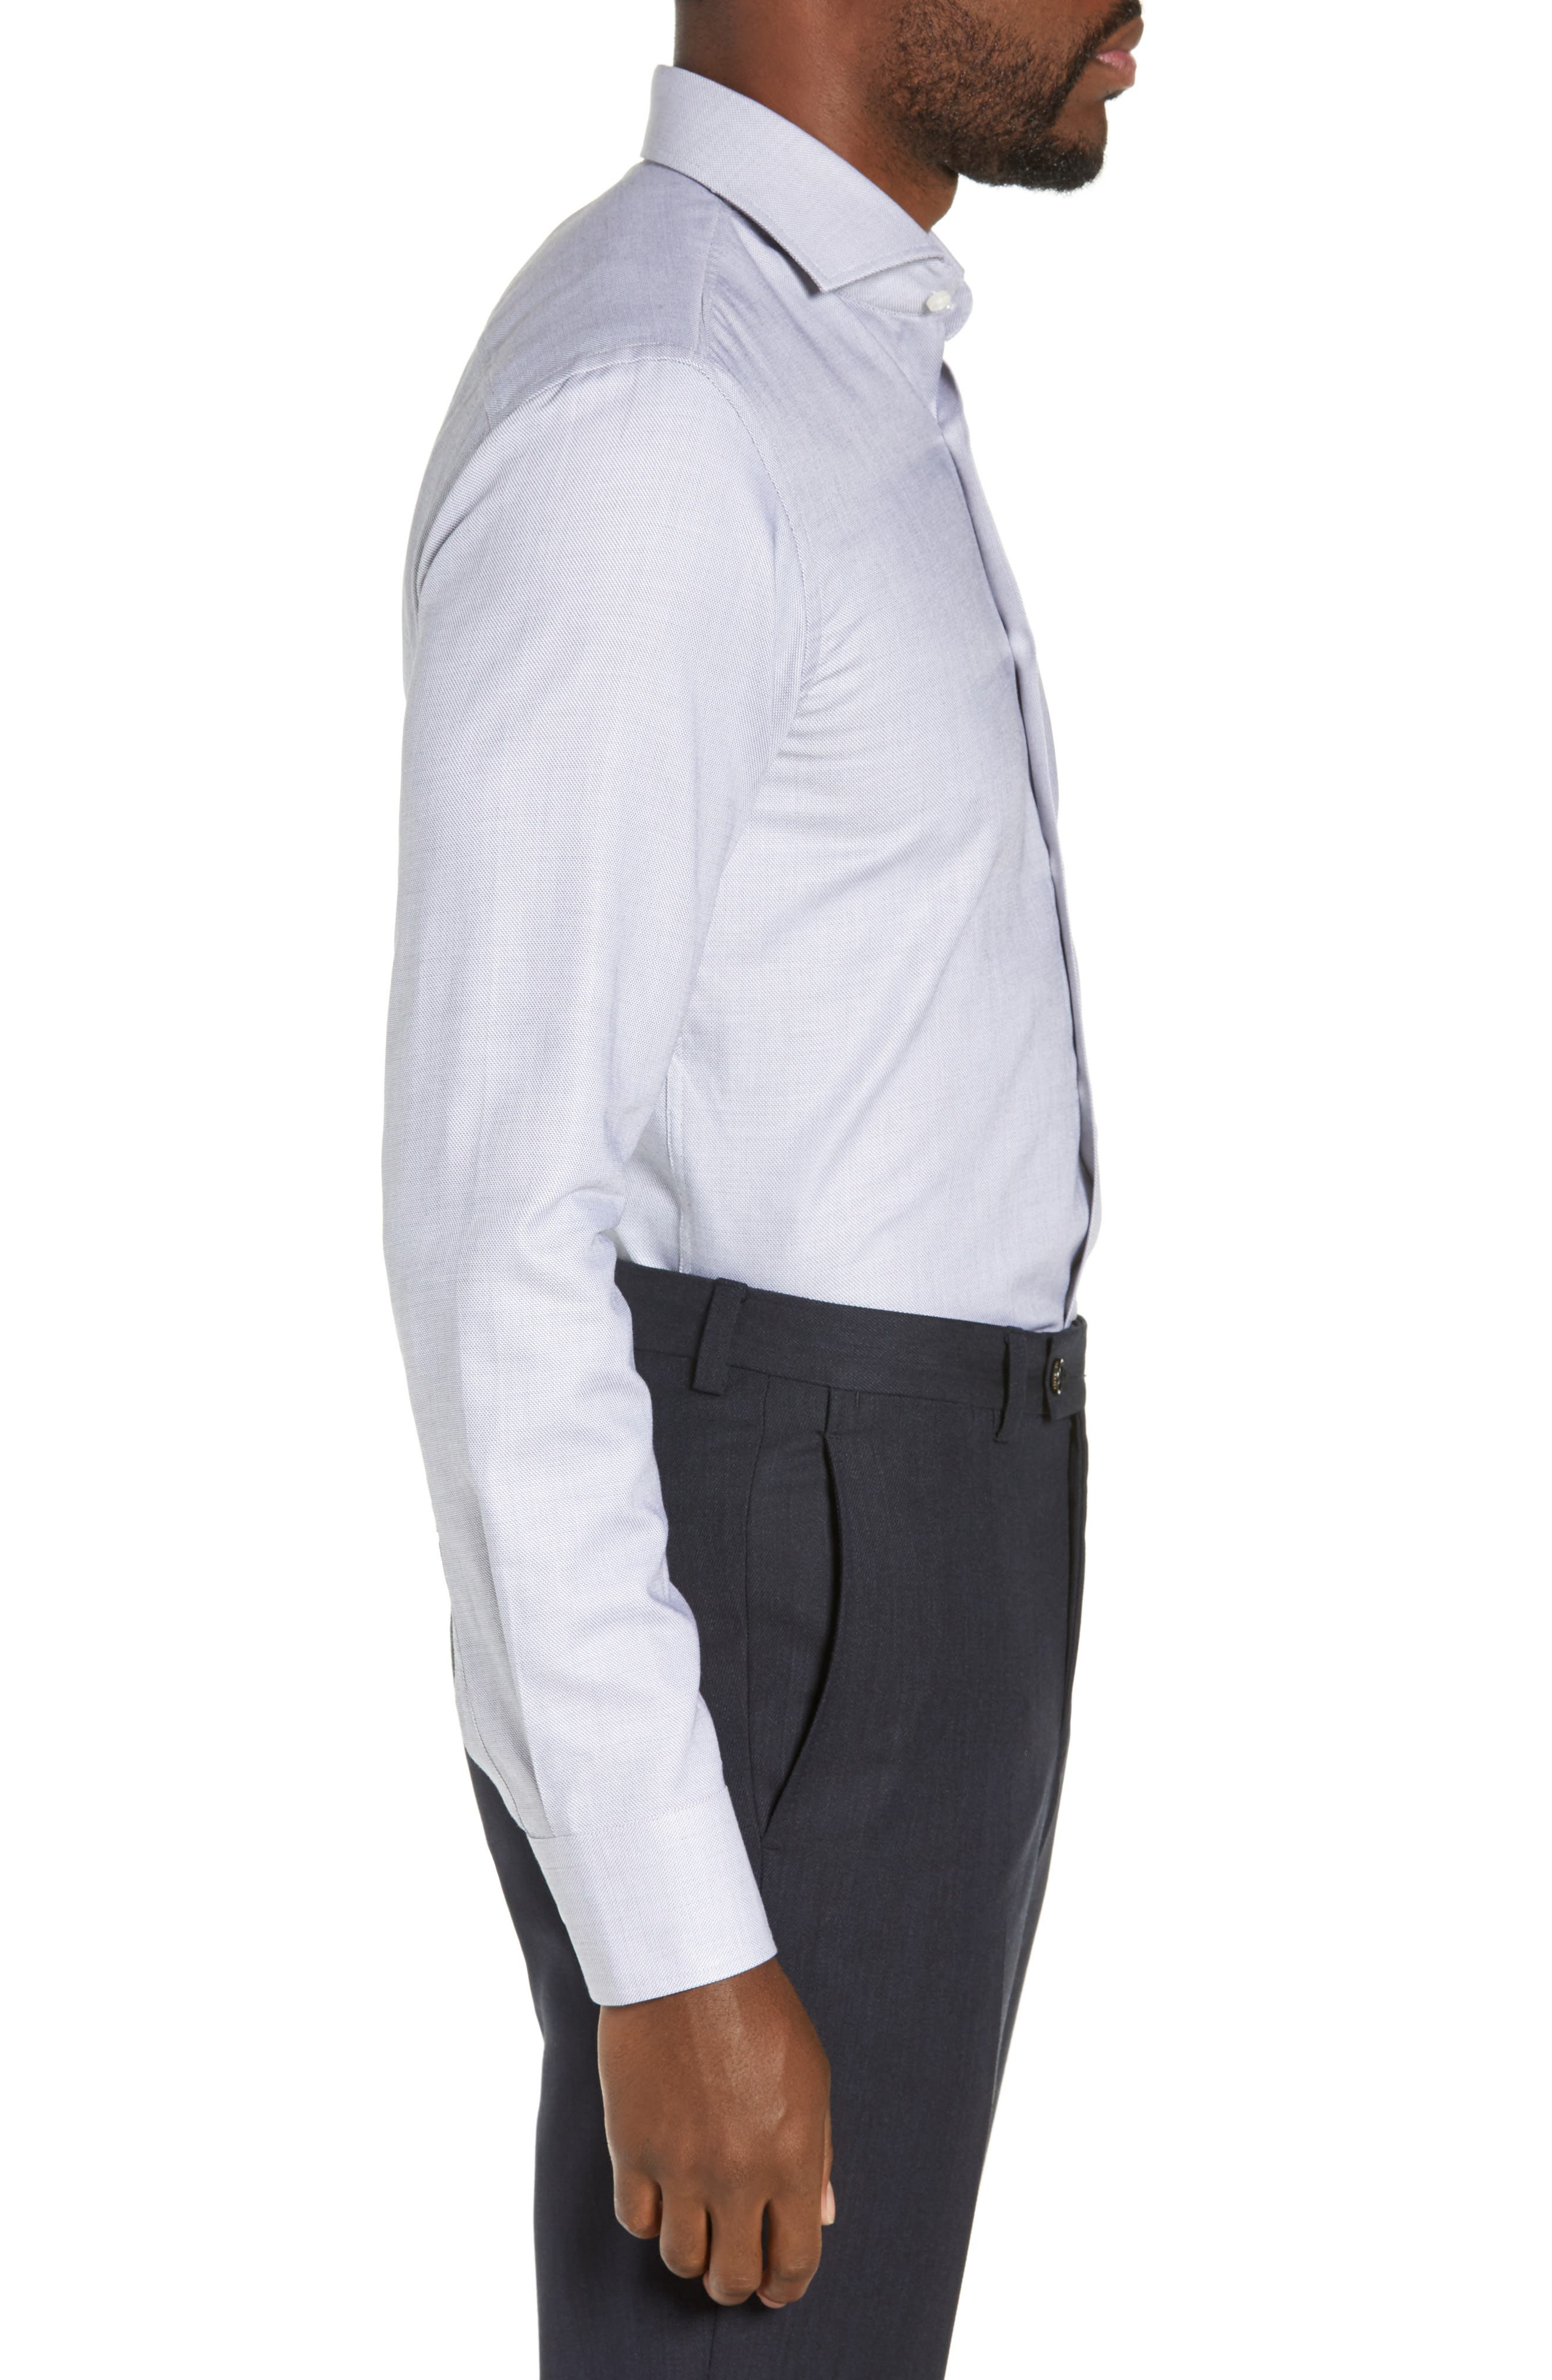 Jason Trim Fit Solid Dress Shirt,                             Alternate thumbnail 4, color,                             BLACK